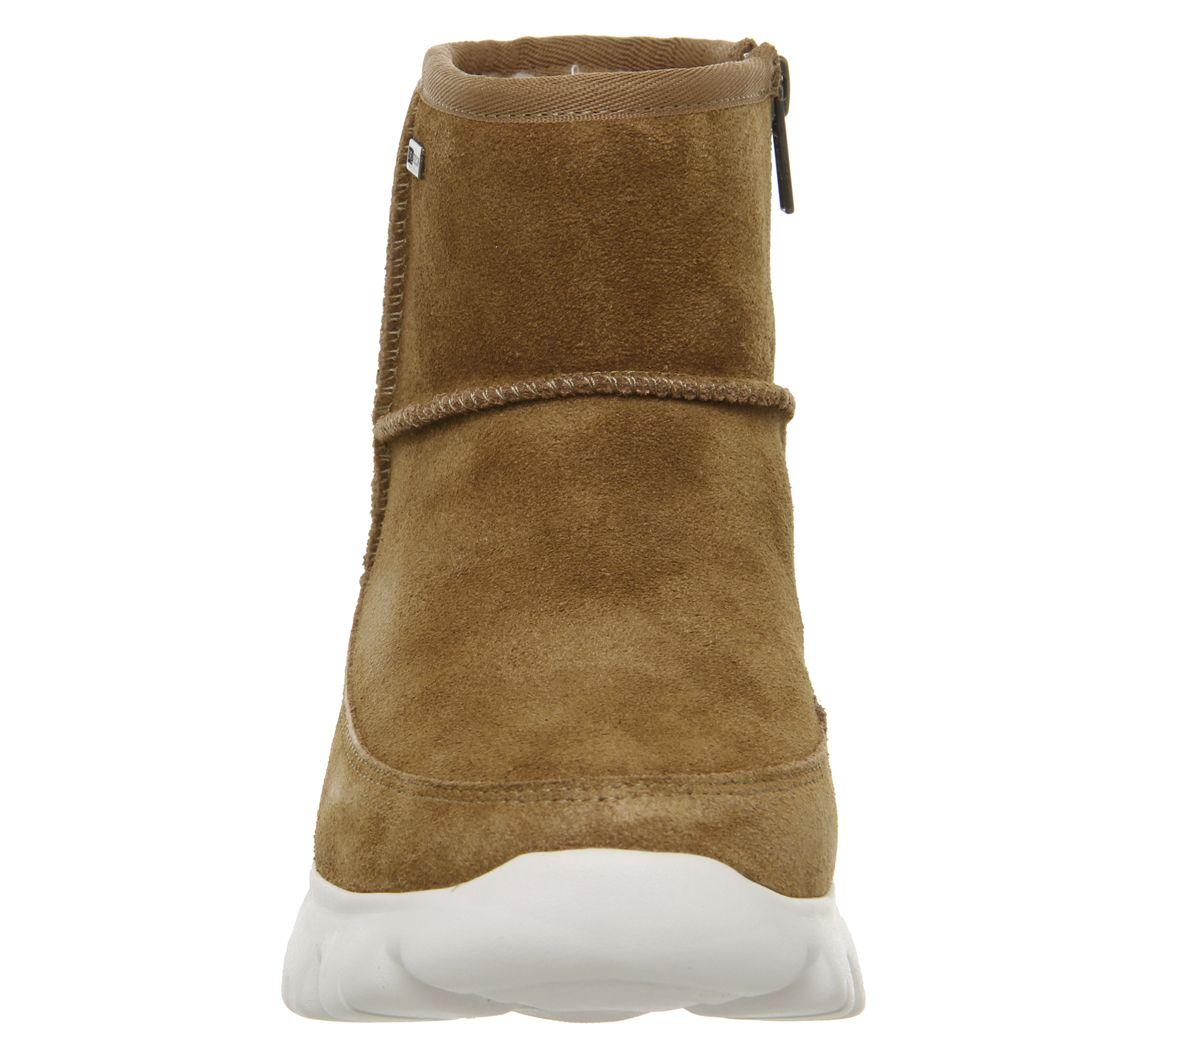 ec78dad2a17 Palomar Sneaker Boots